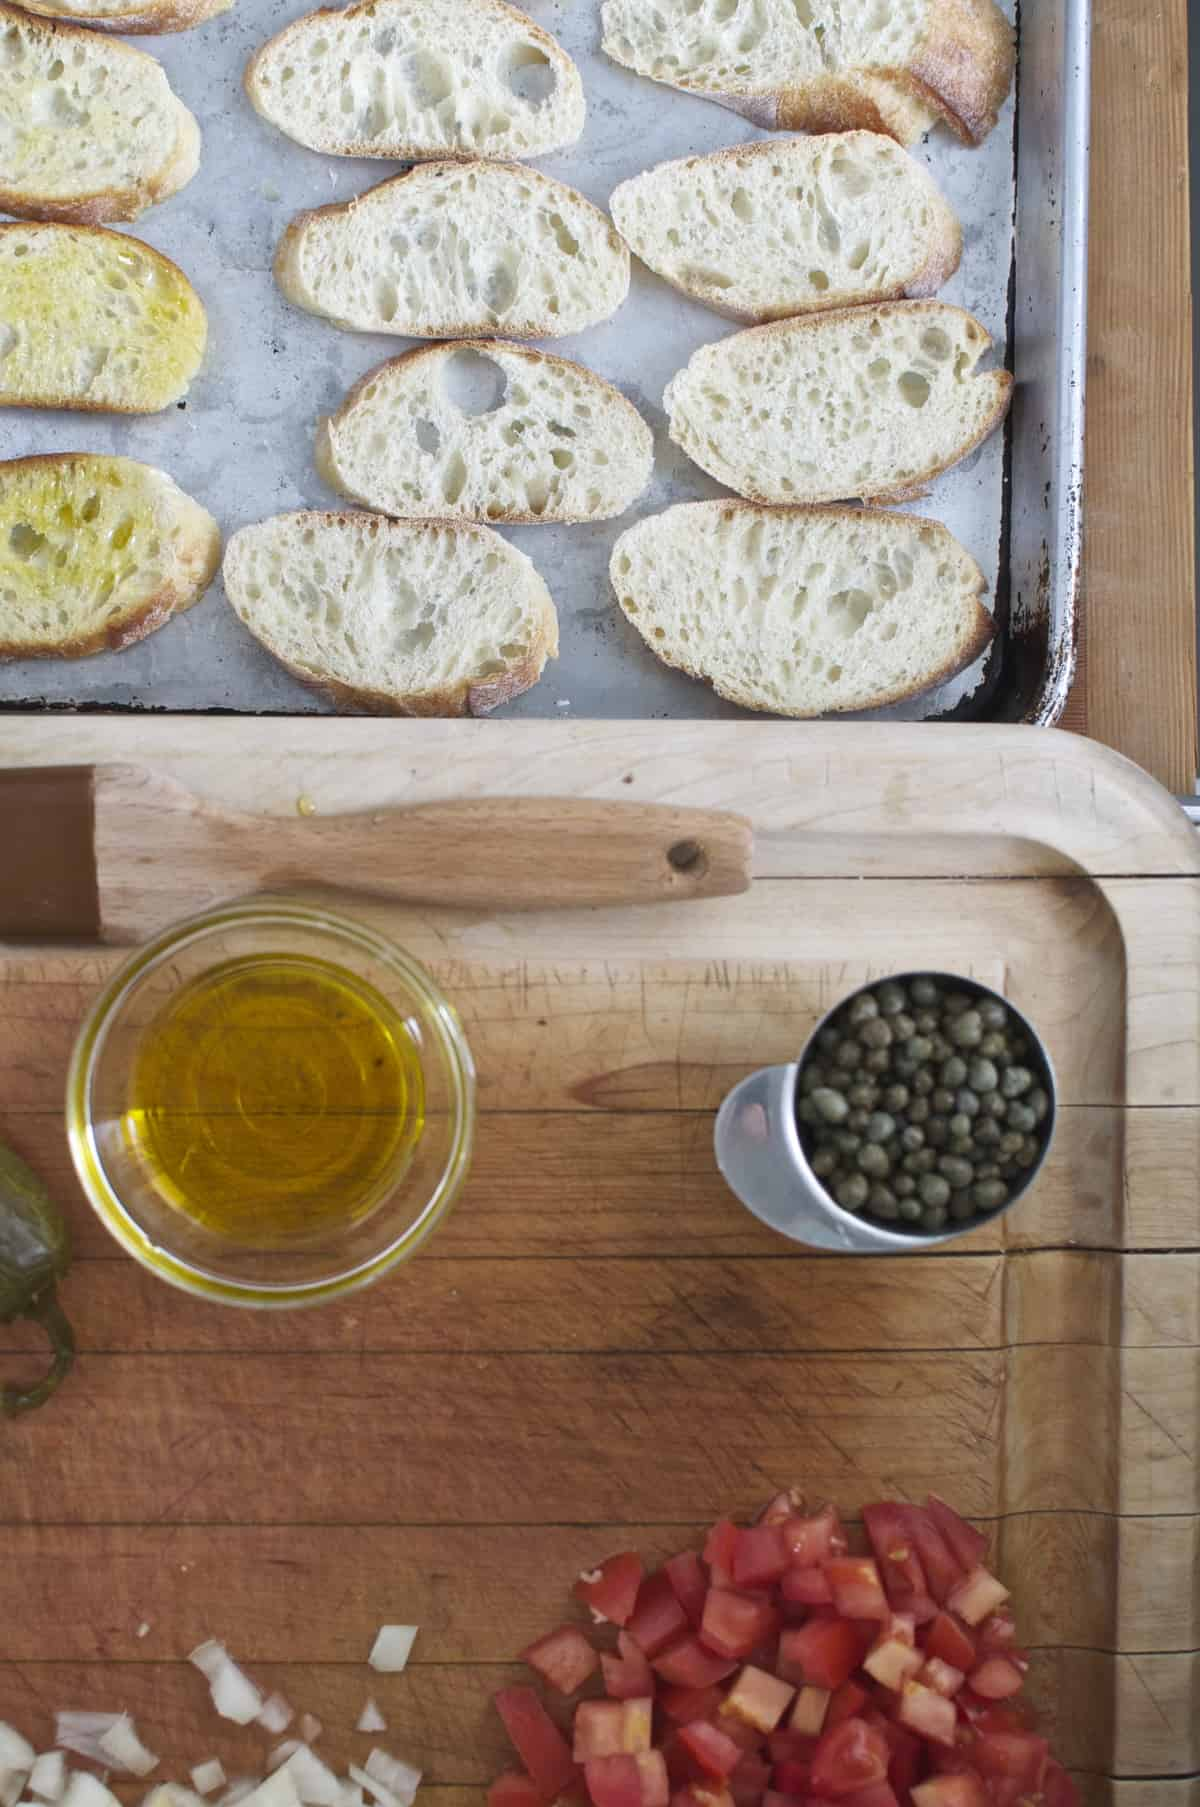 Salt Cod and Baguette